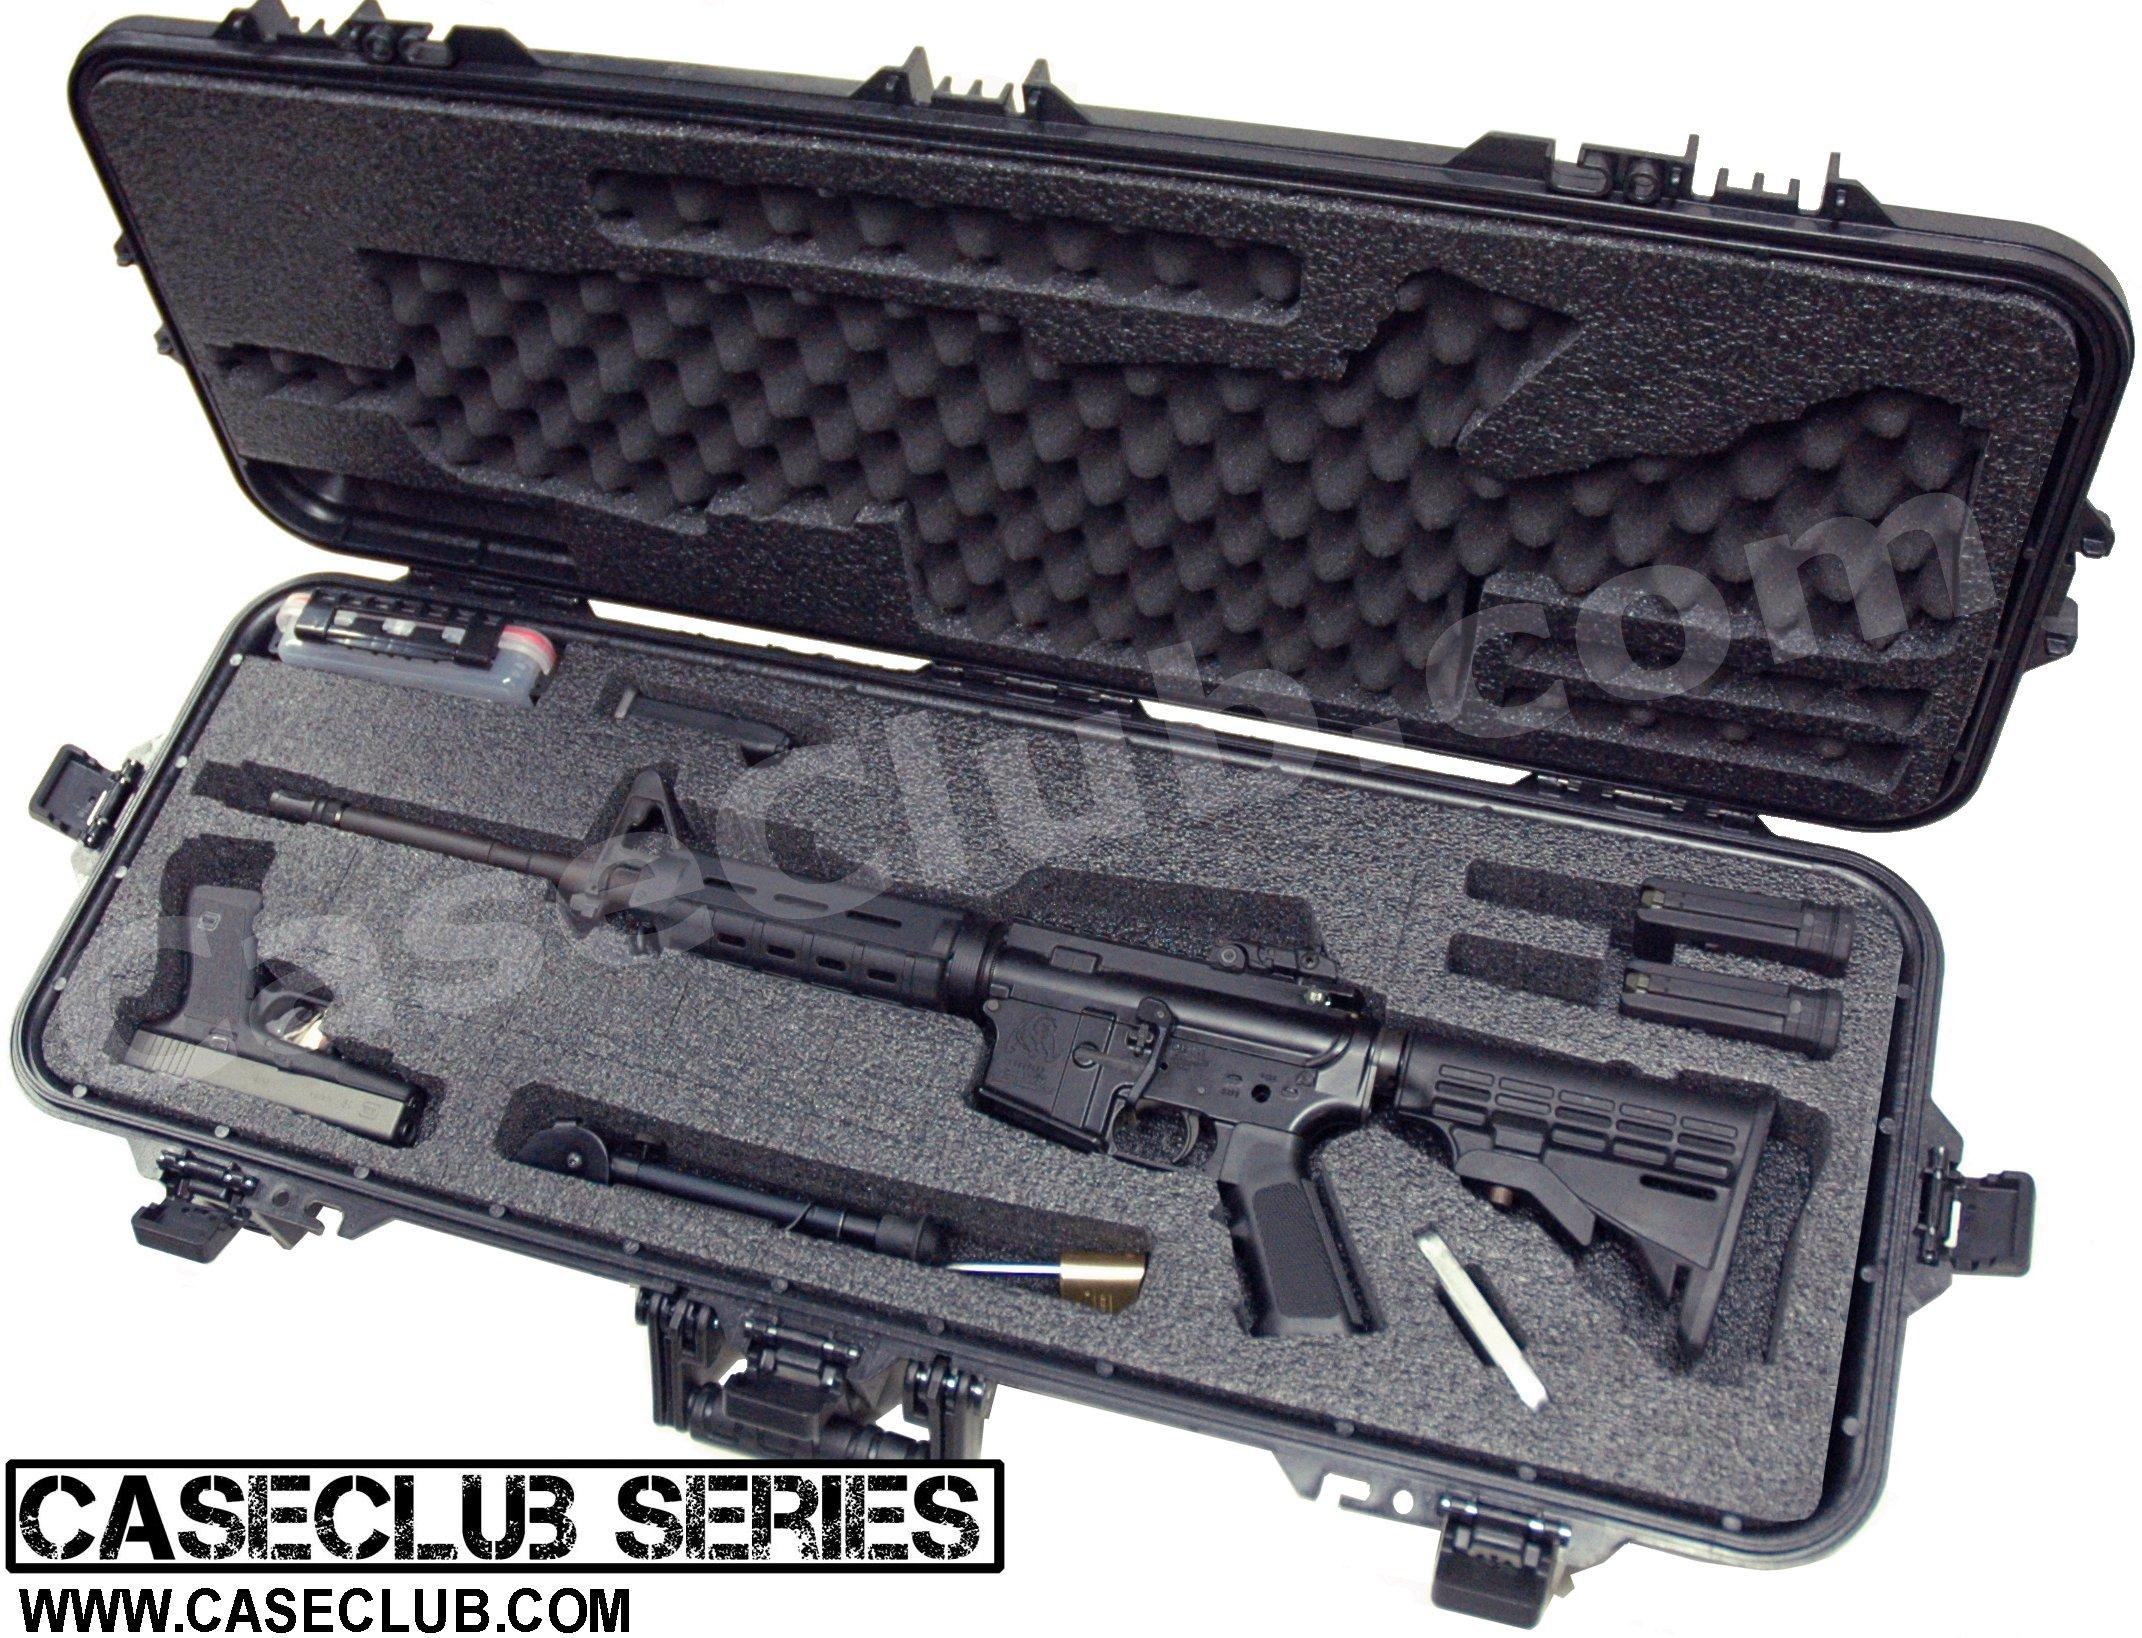 Case Club Waterproof AR15 Rifle Case with Silica Gel ...